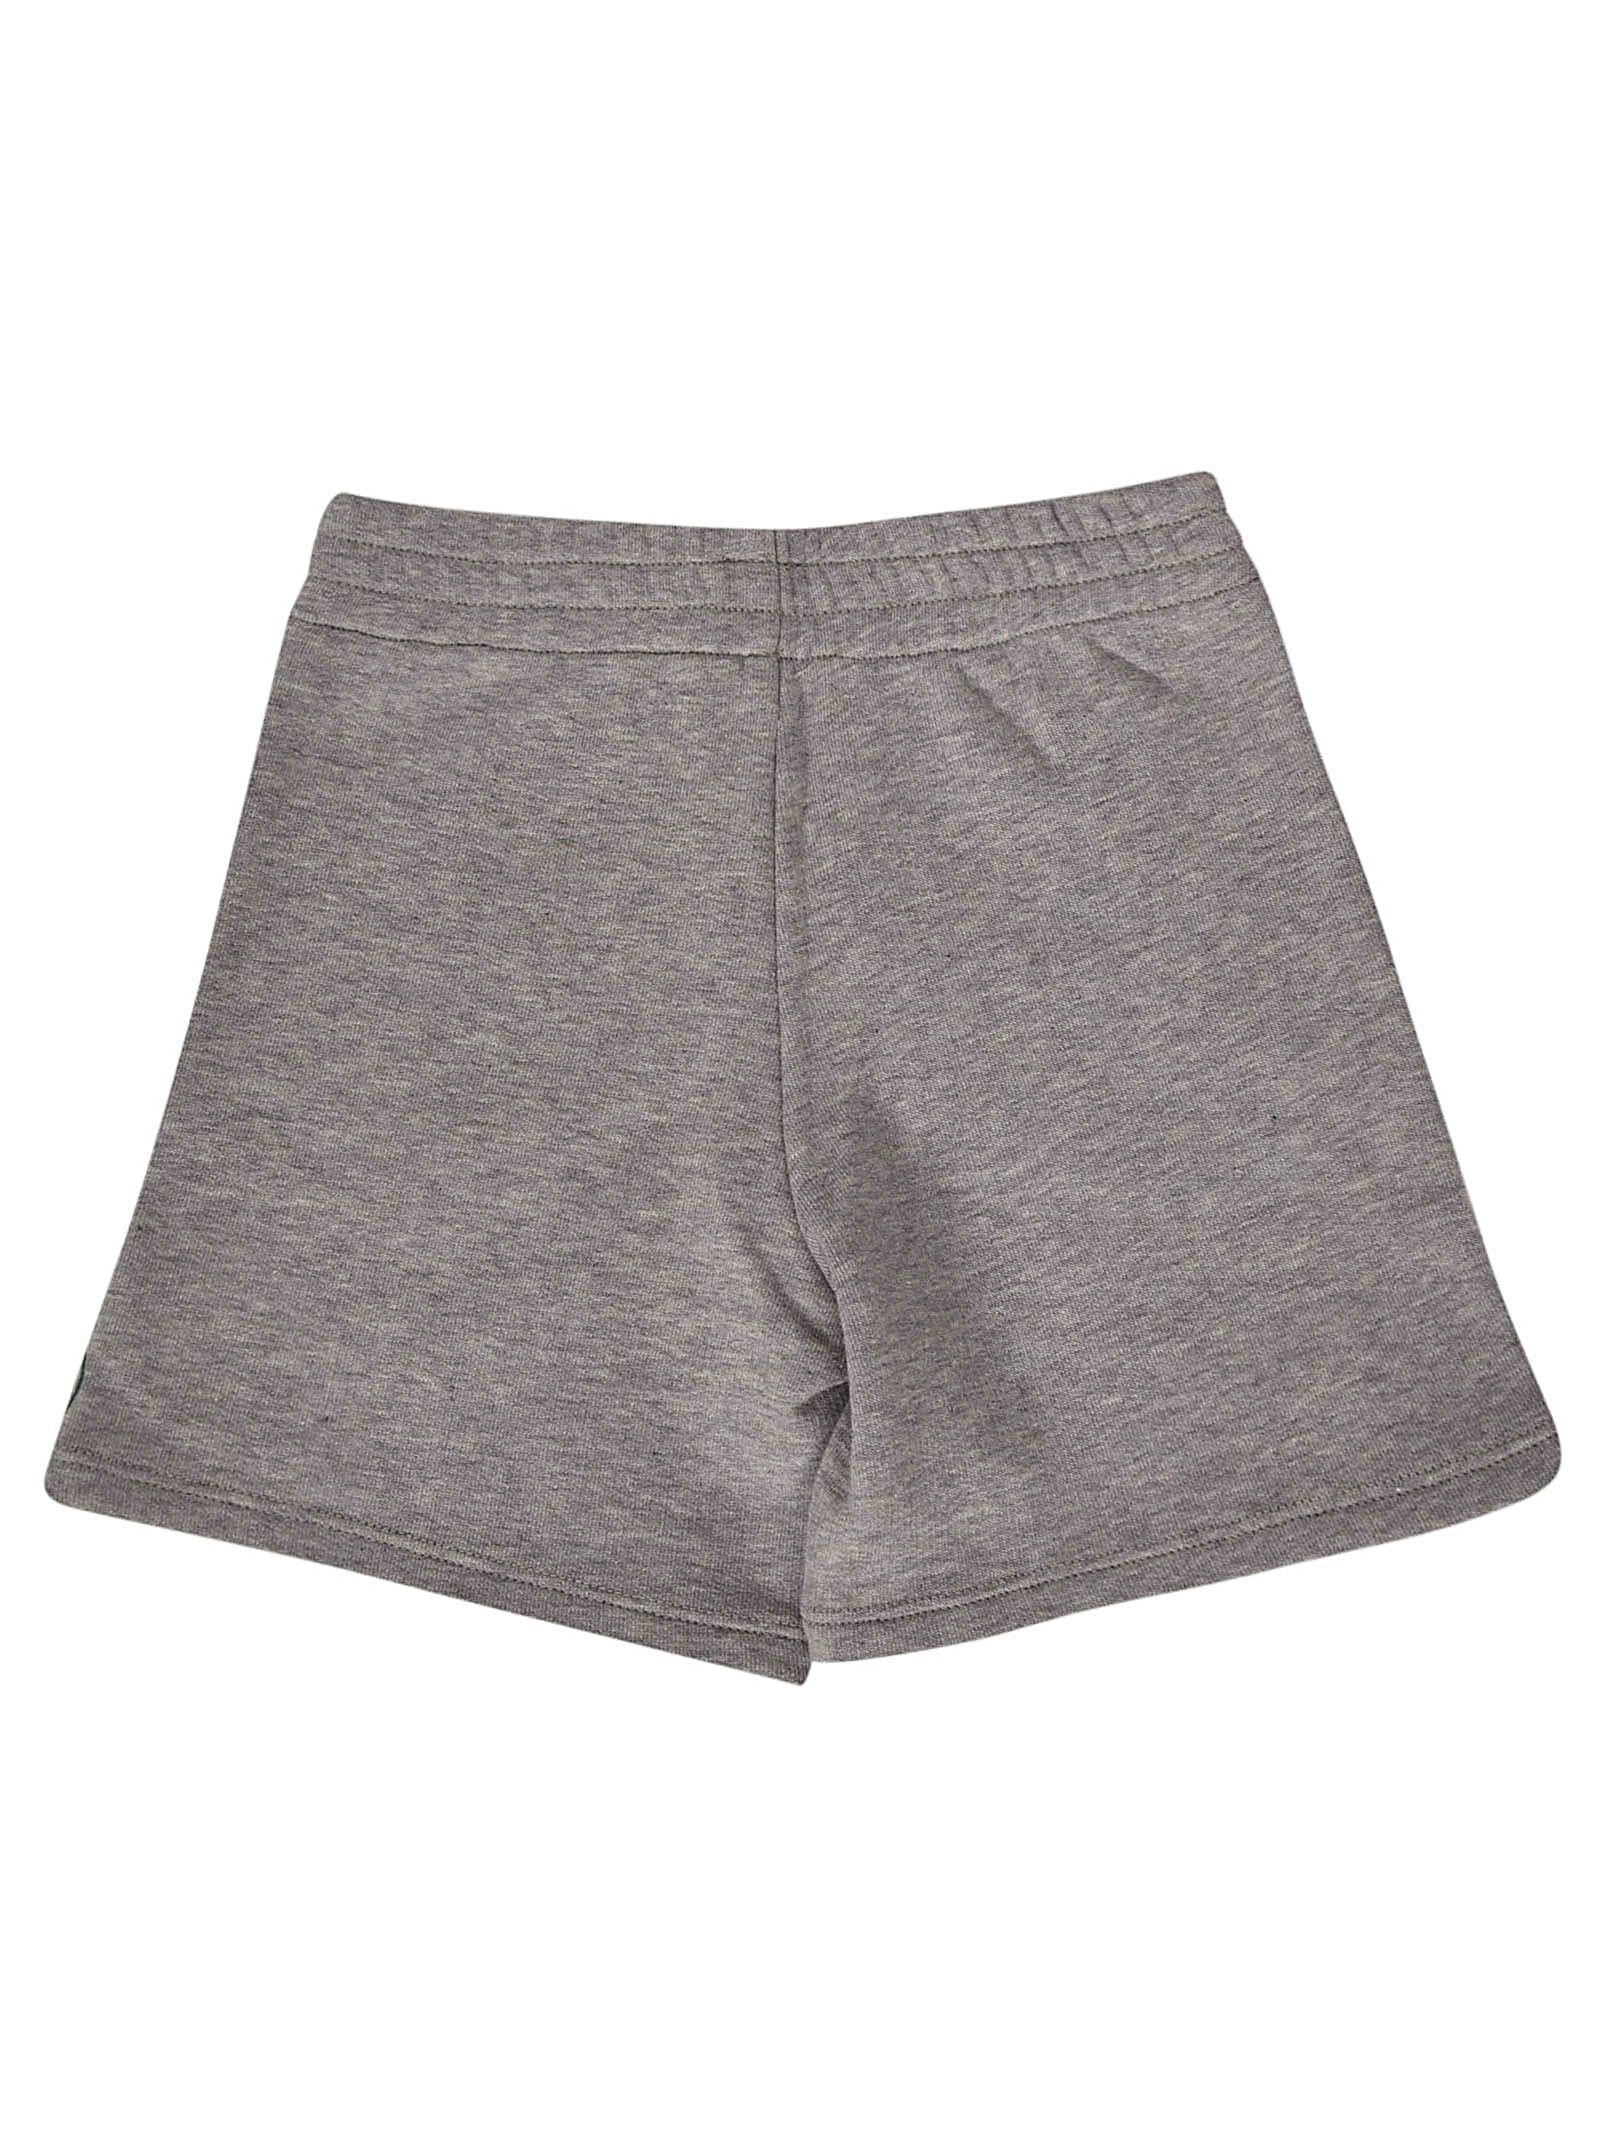 2812b3c83eb Gucci Gucci Kids Logo Shorts - Grey - 10913754